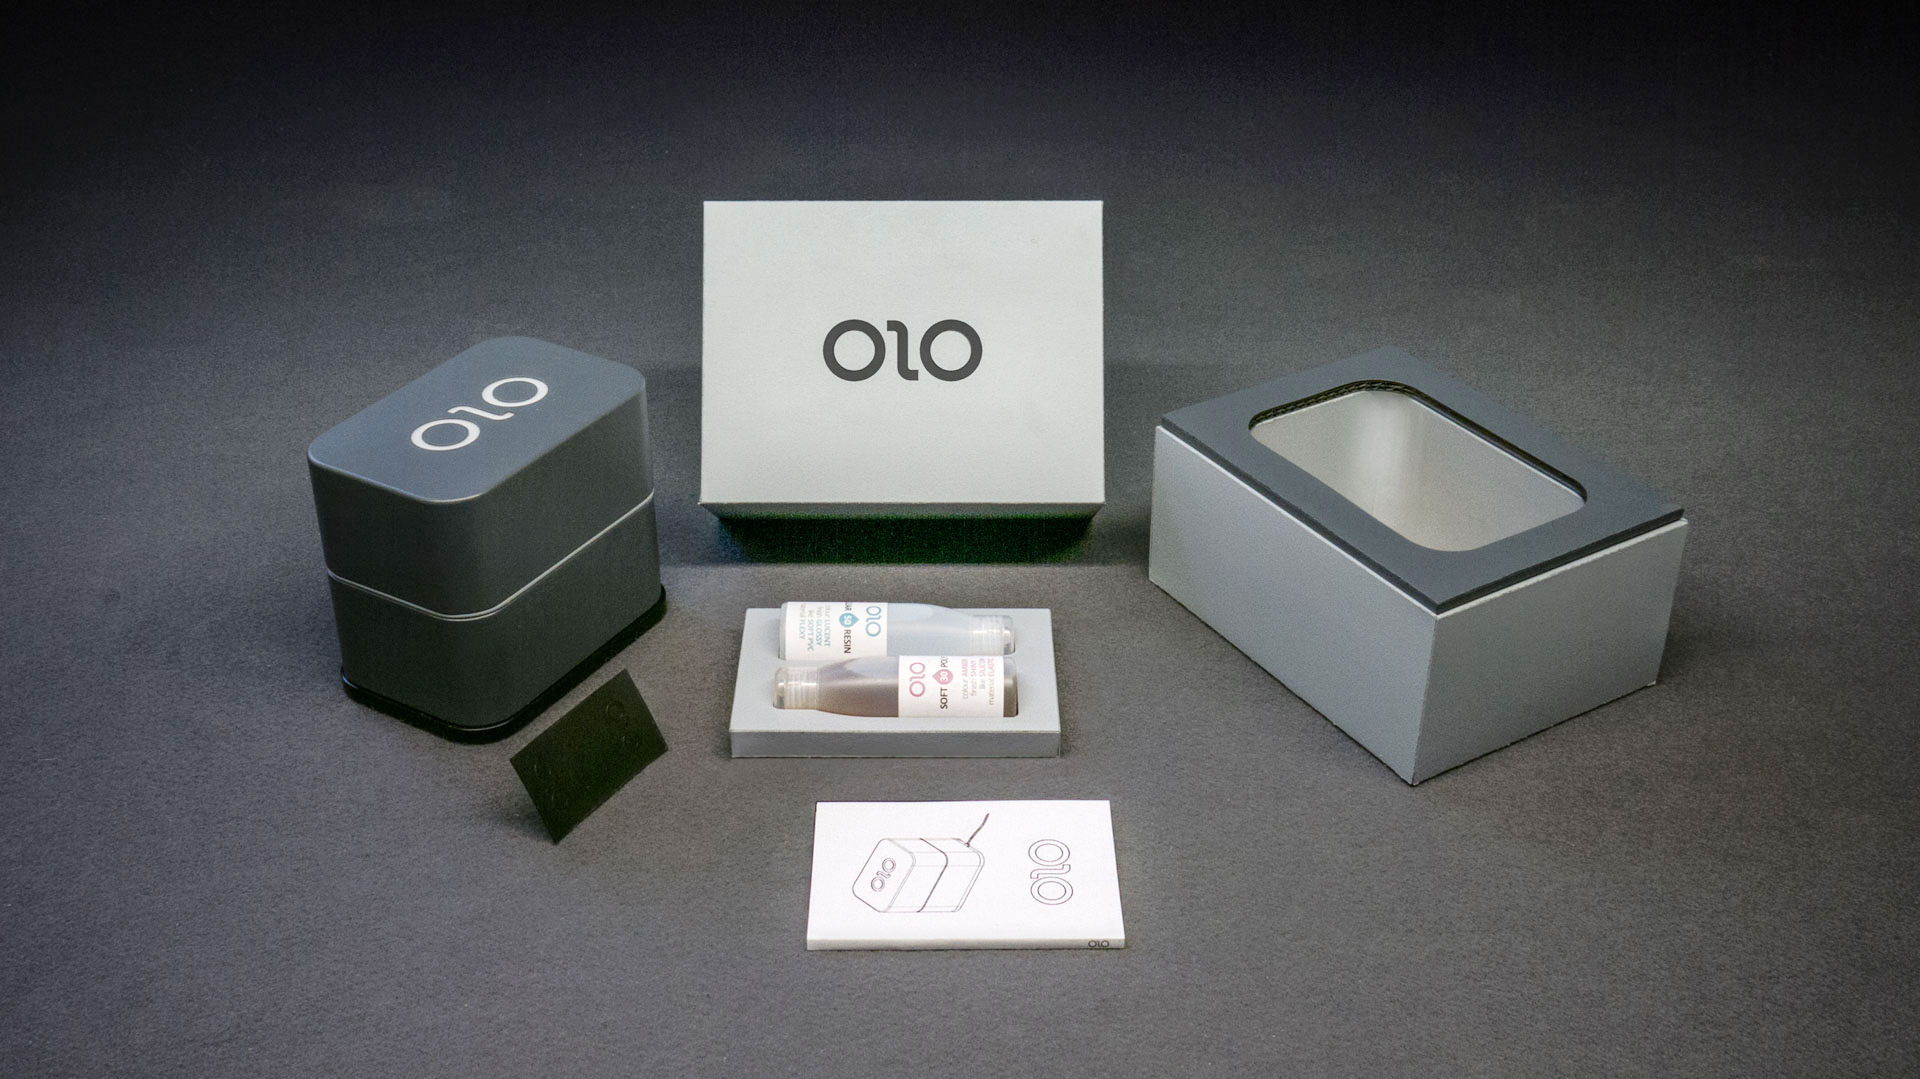 olo-08